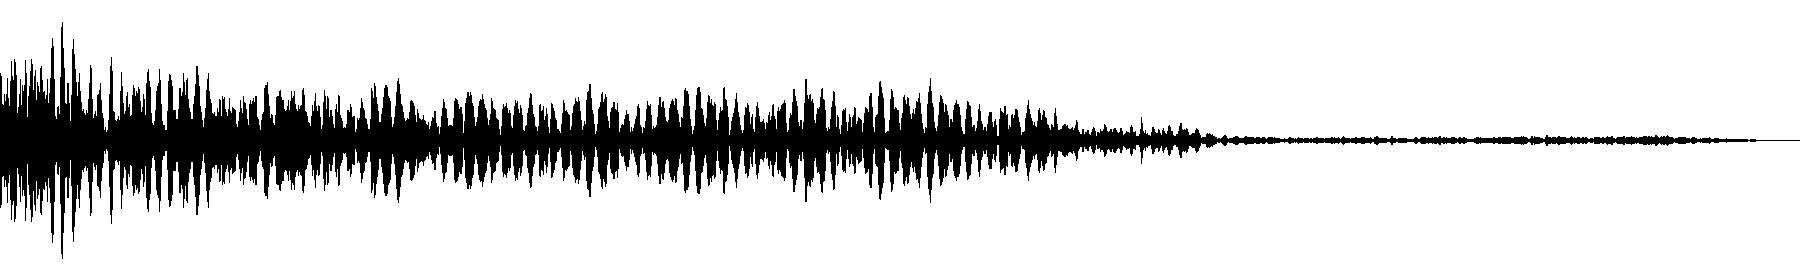 vedh synth cut 197 g